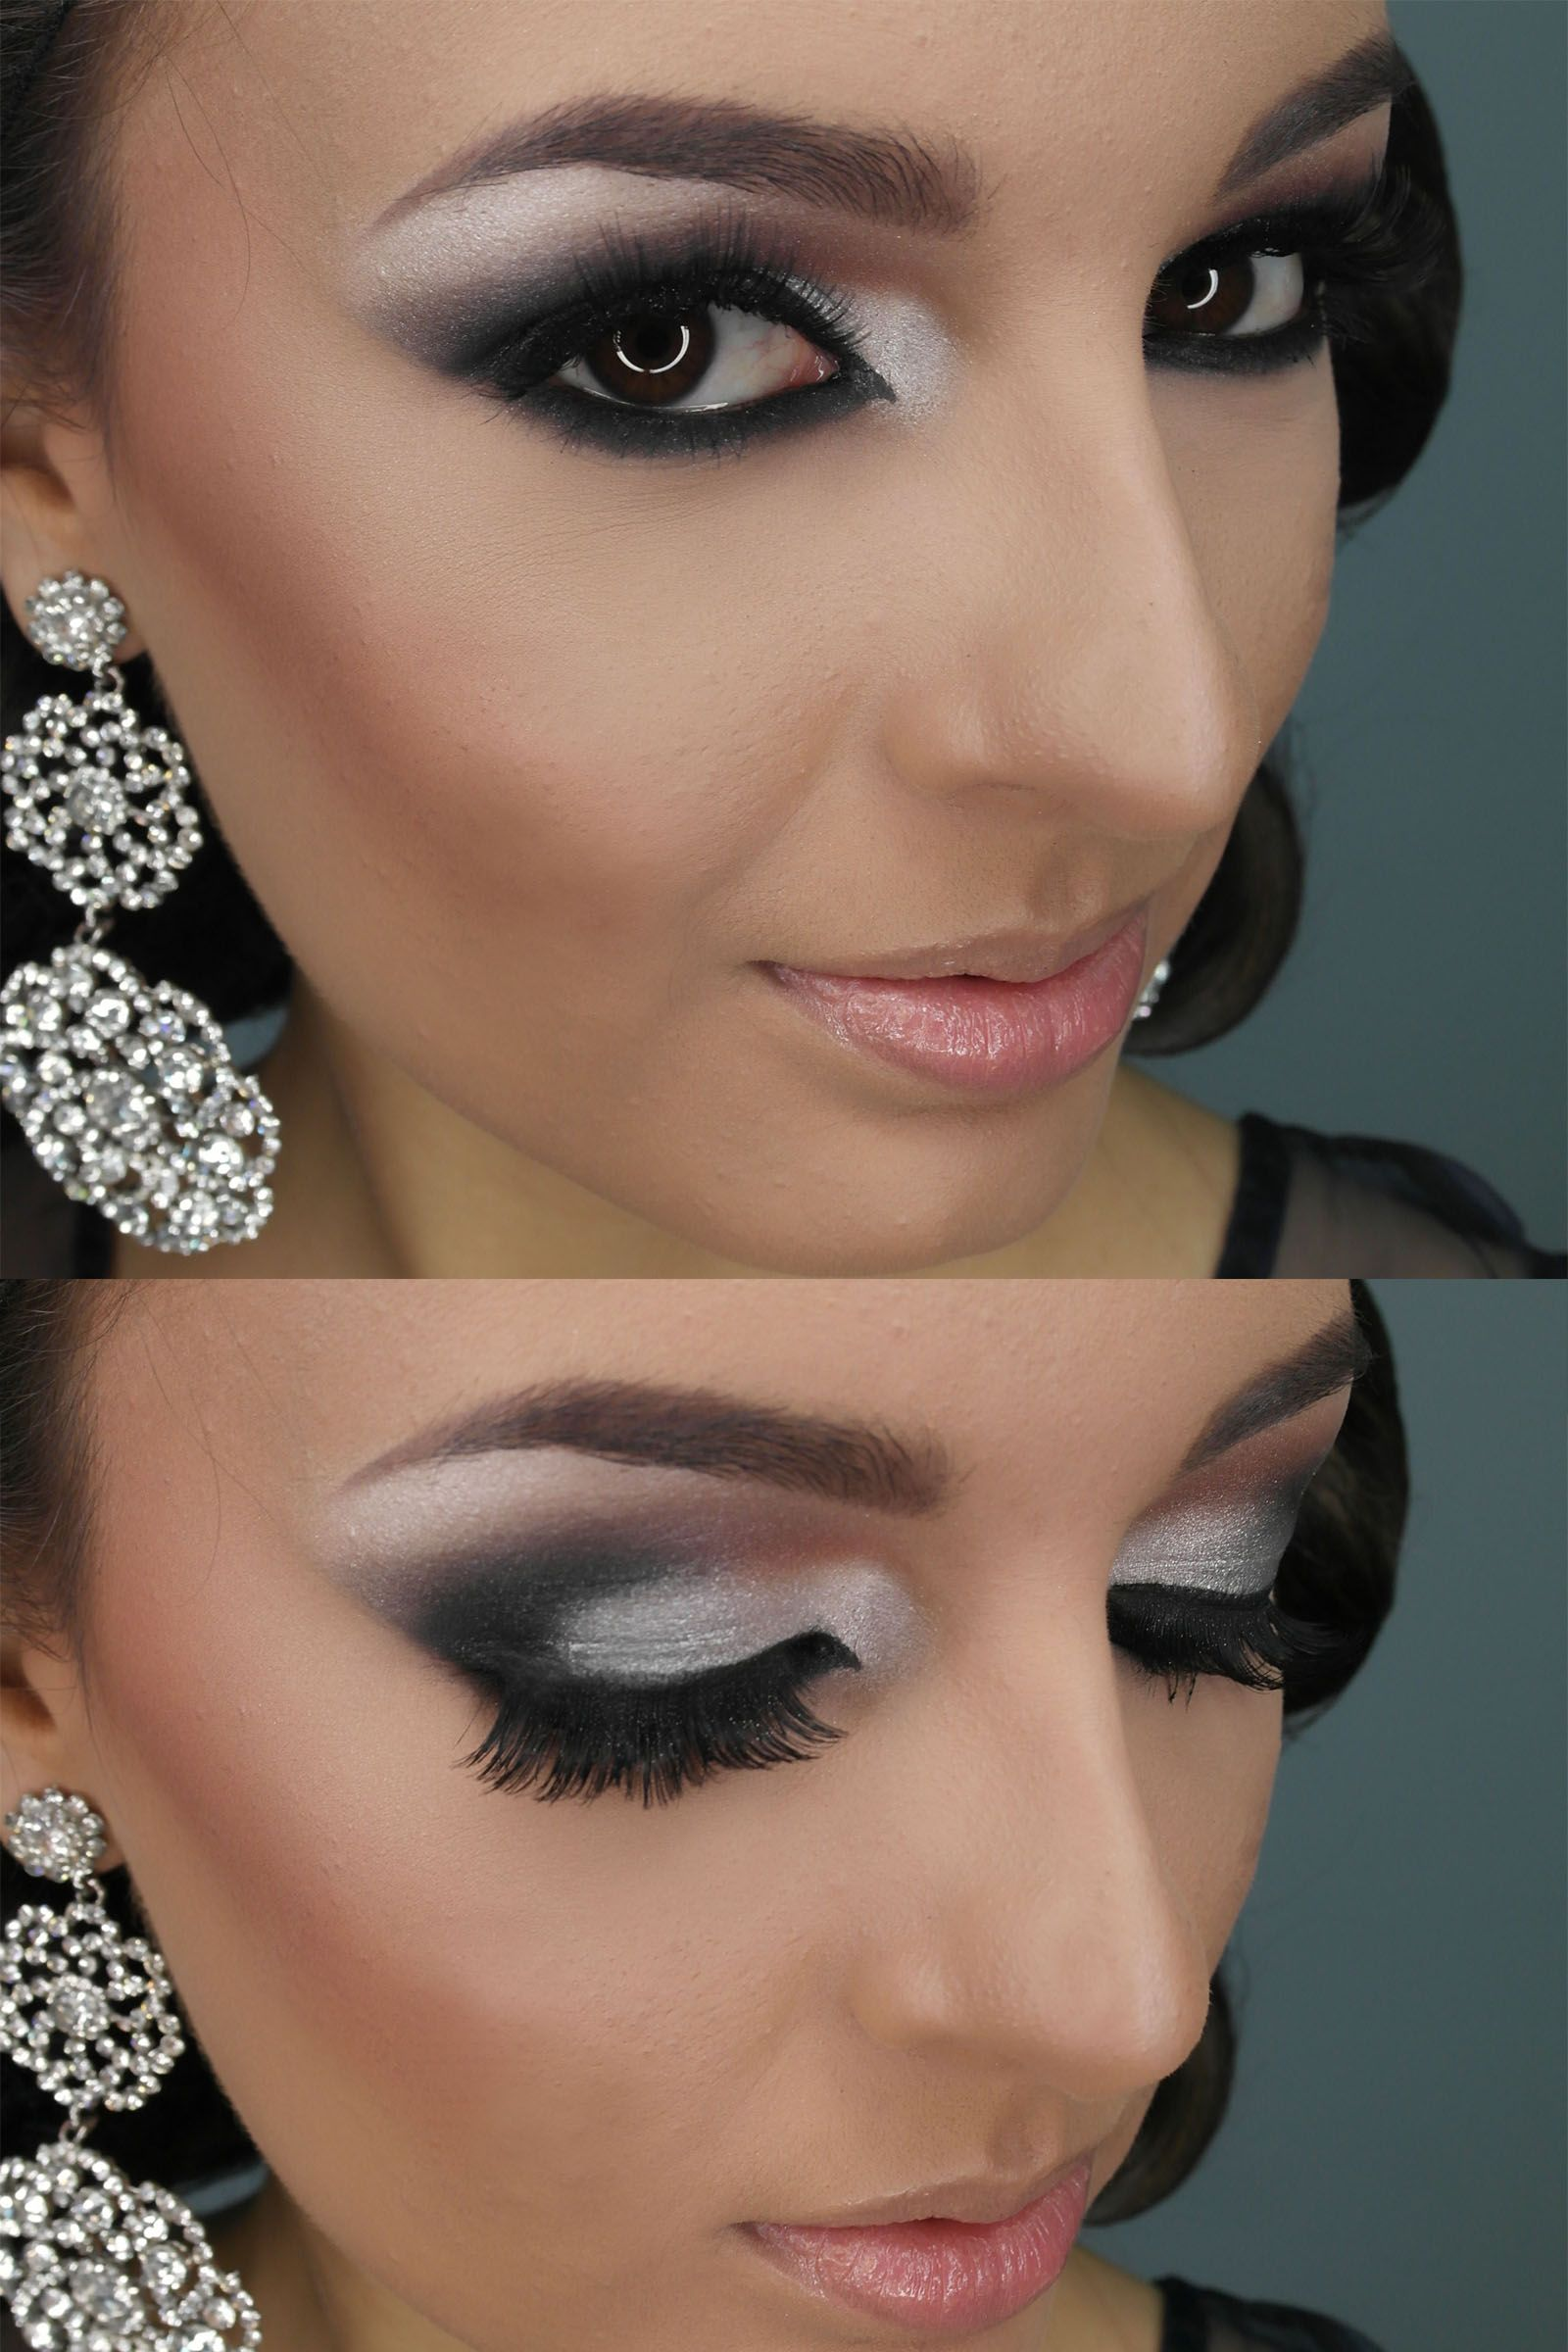 Lilia Mercedes González Delgado. @lmgd18 #missteenlossantos2016  makeup and hair by  R&J SALON @rjsalon_ 🇵🇦 @jkharyn @rodolfoalexander  PREVIA CITA ☎️ 394 8158 / 59 BETHANIA. CAMINO REAL  ____